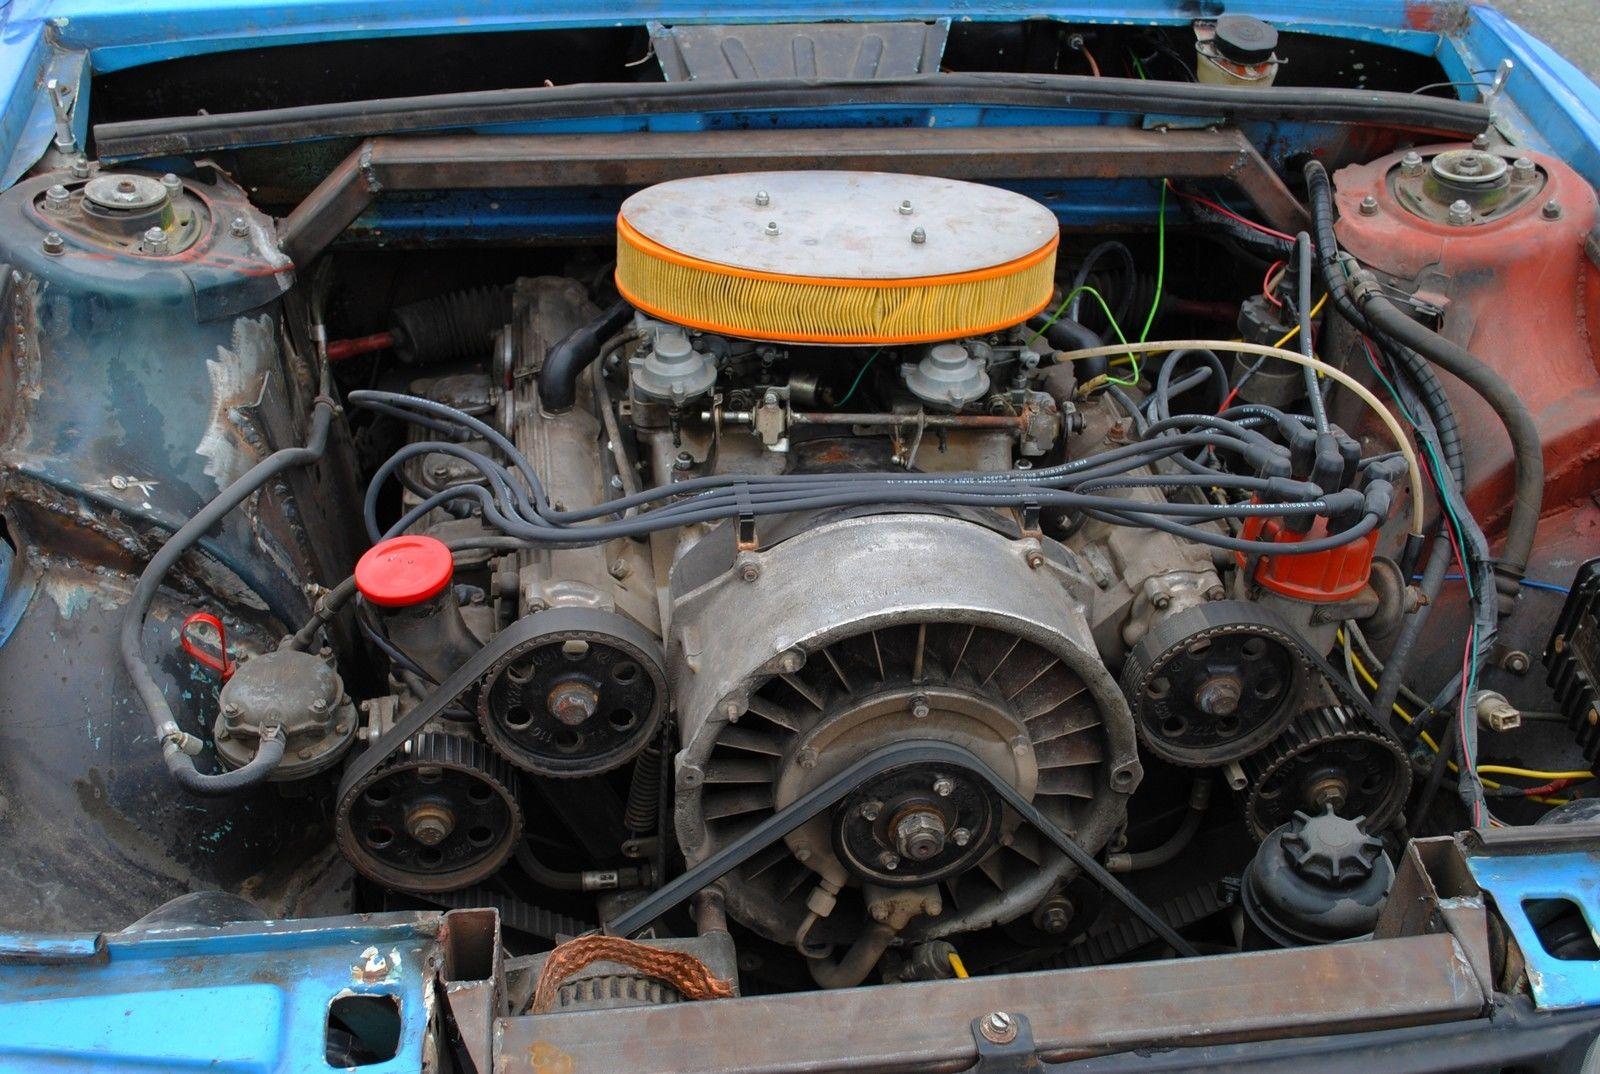 Skrizil Skodu 120 A Tatru 613 Skoda V8 Ma 168 Koni Topspeed Sk